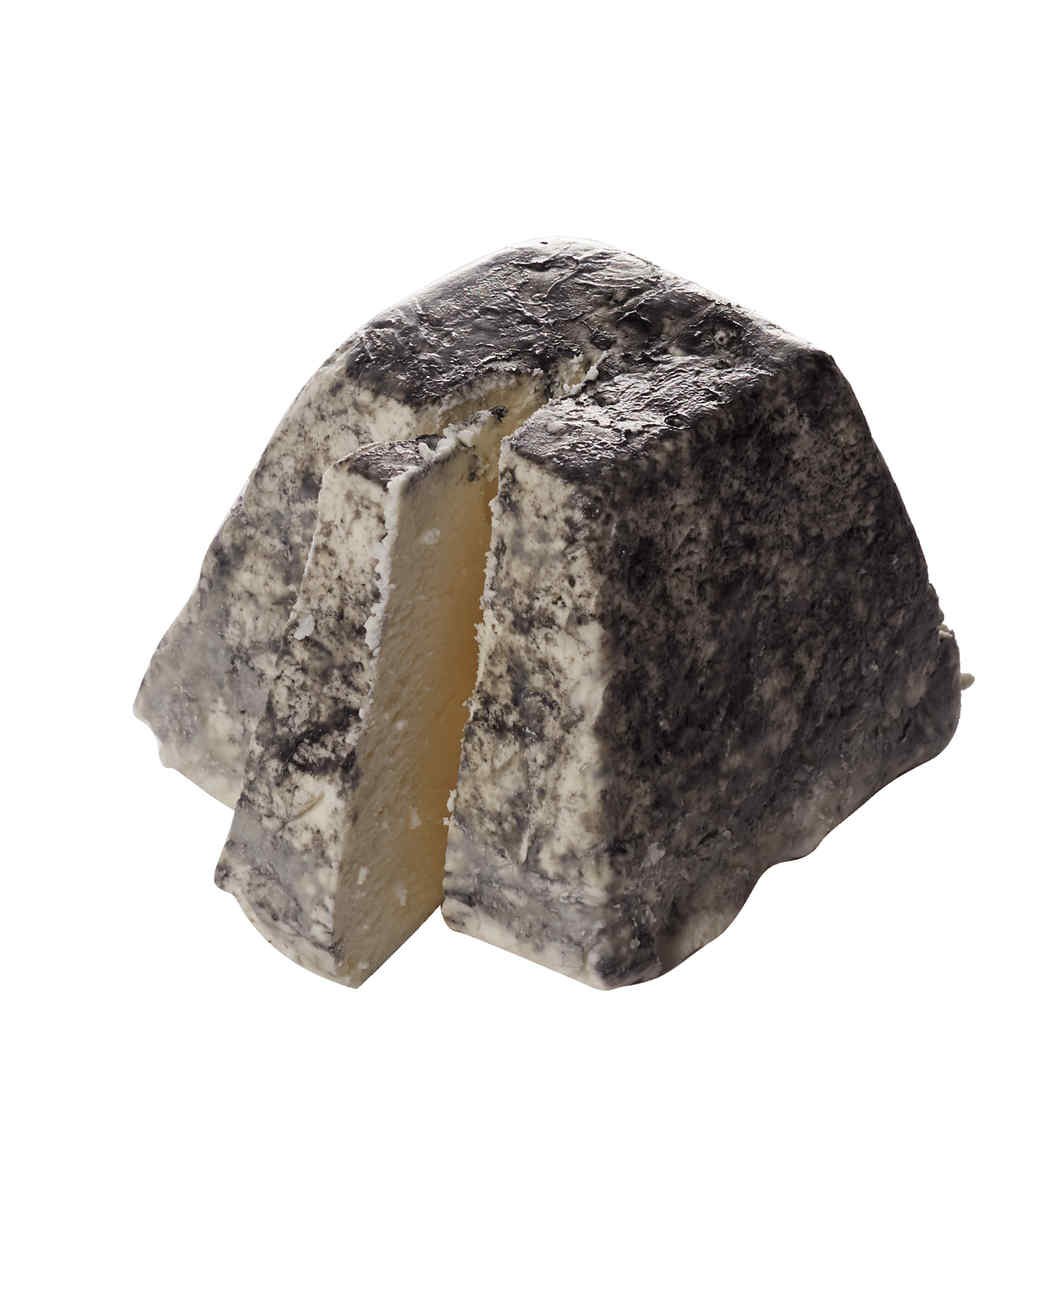 ash-goat-cheese-004-d111263.jpg